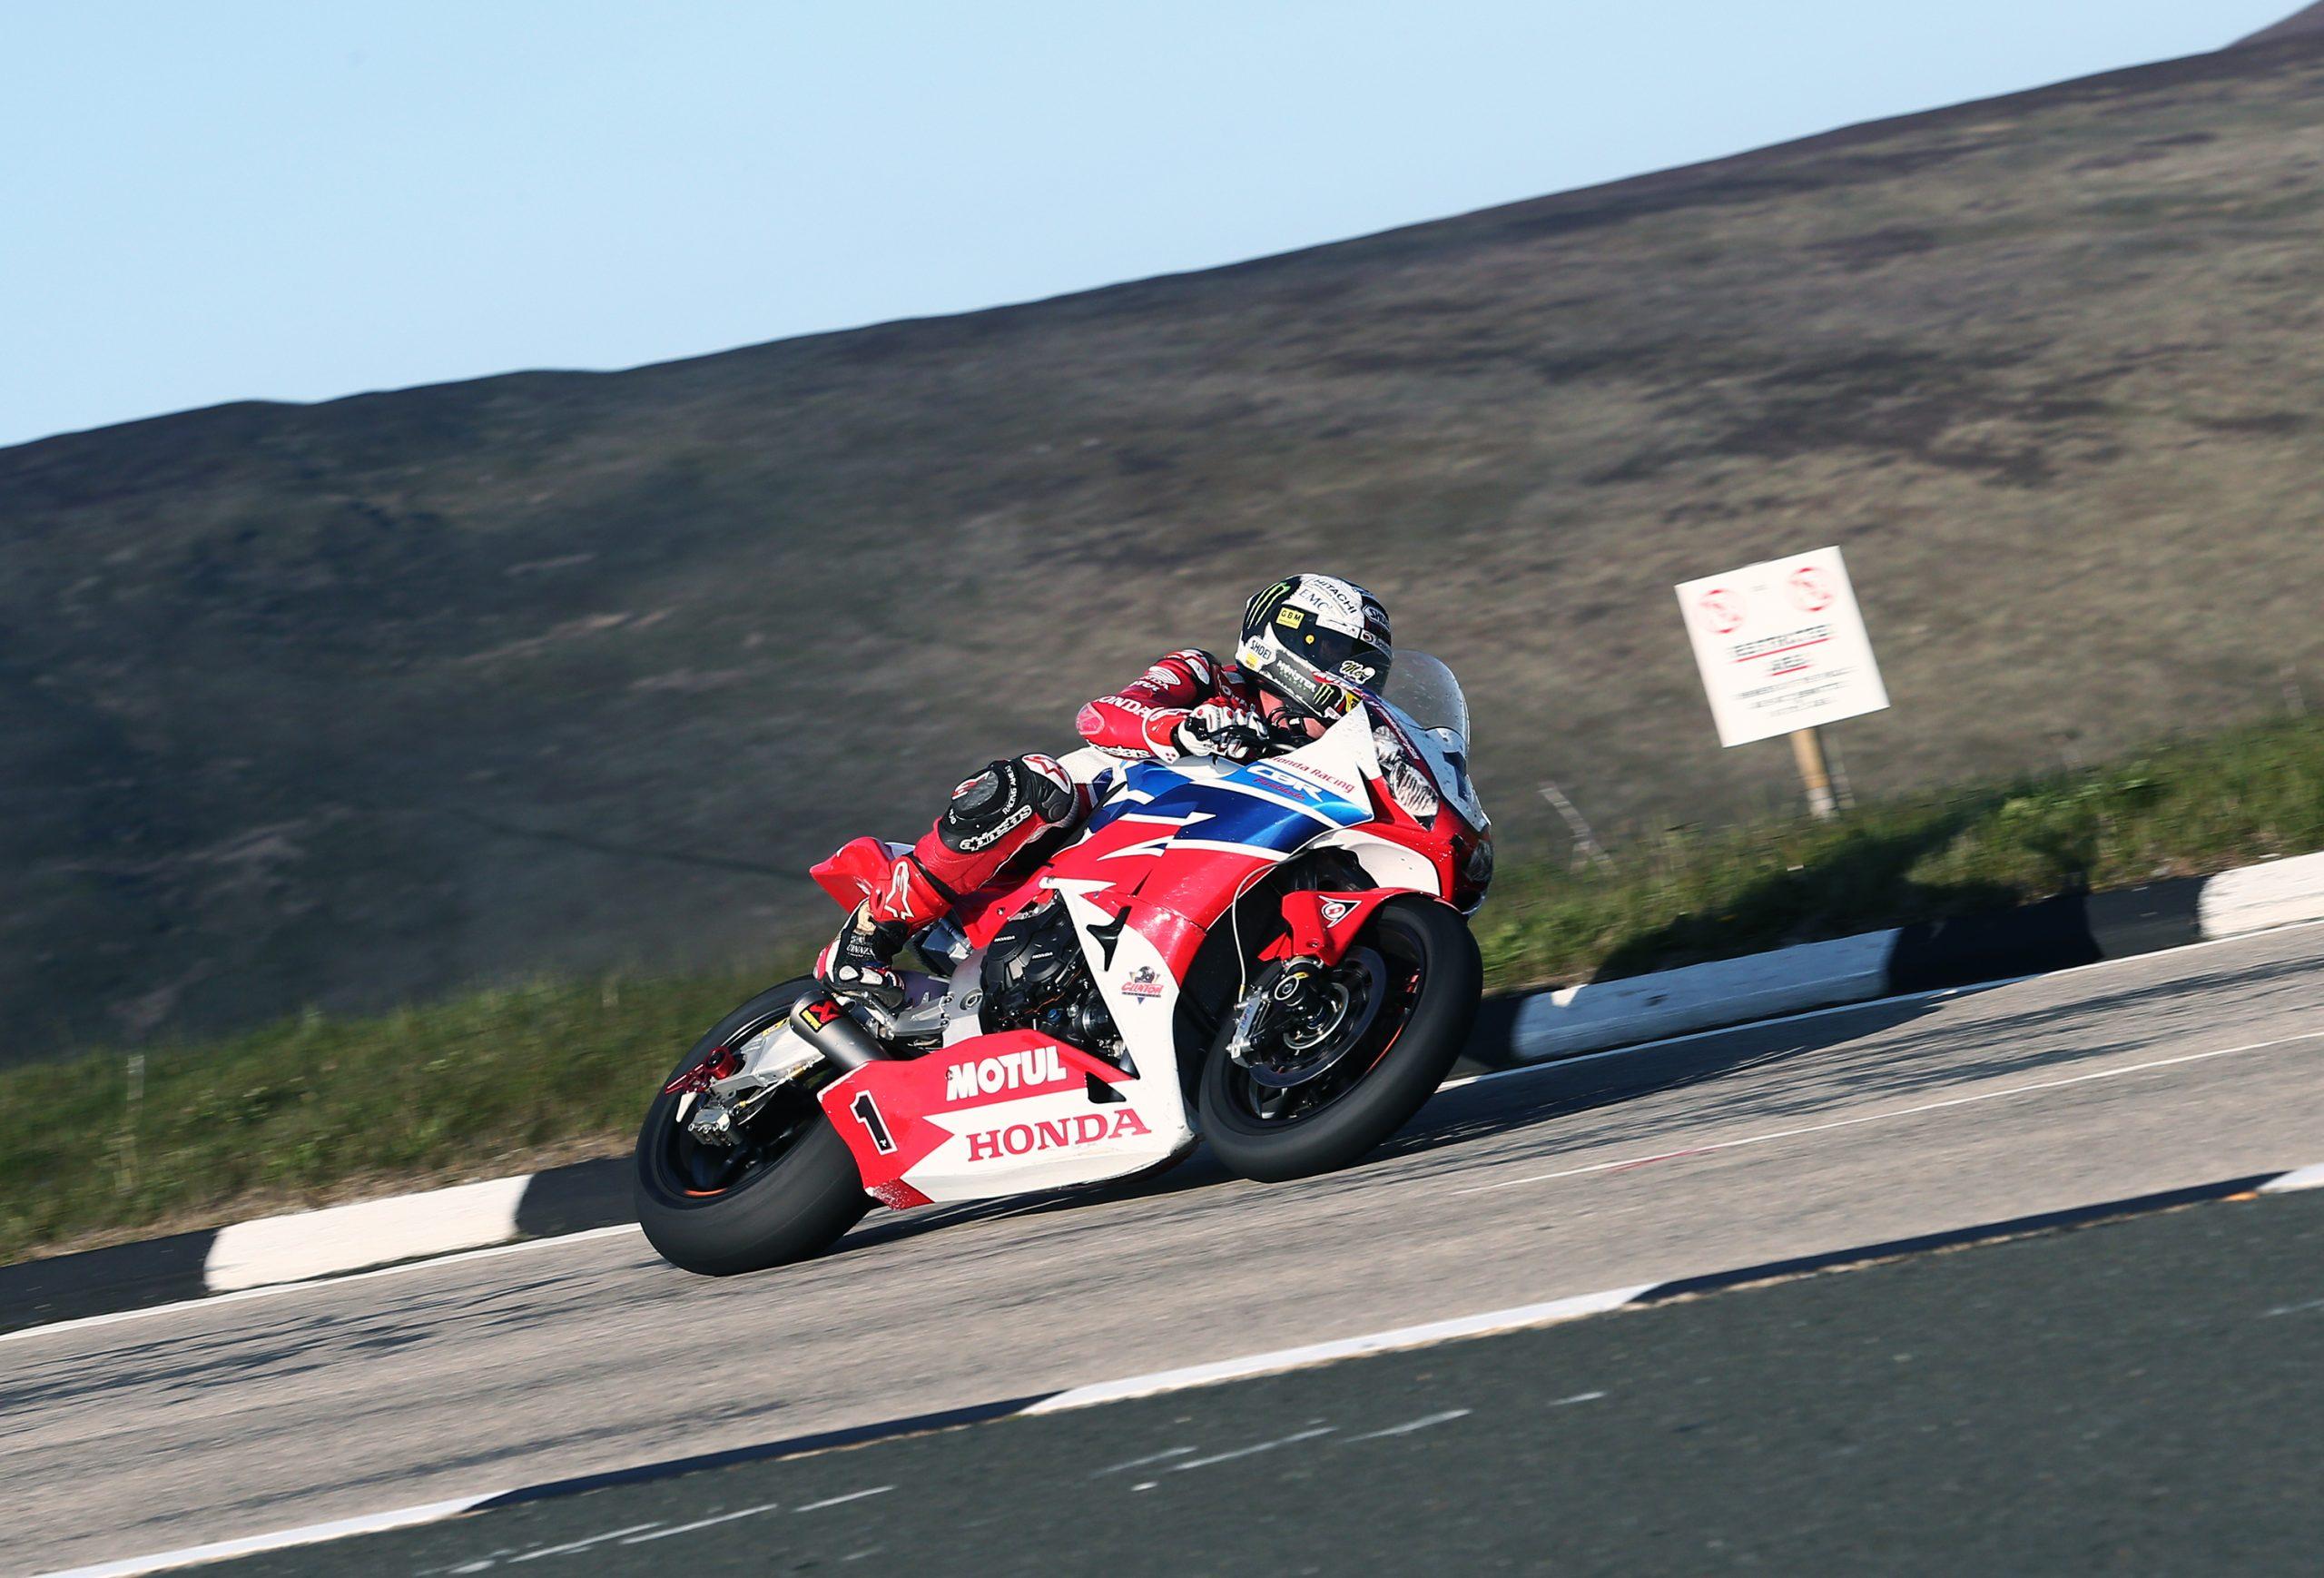 John McGuinness racing at Isle of Man TT